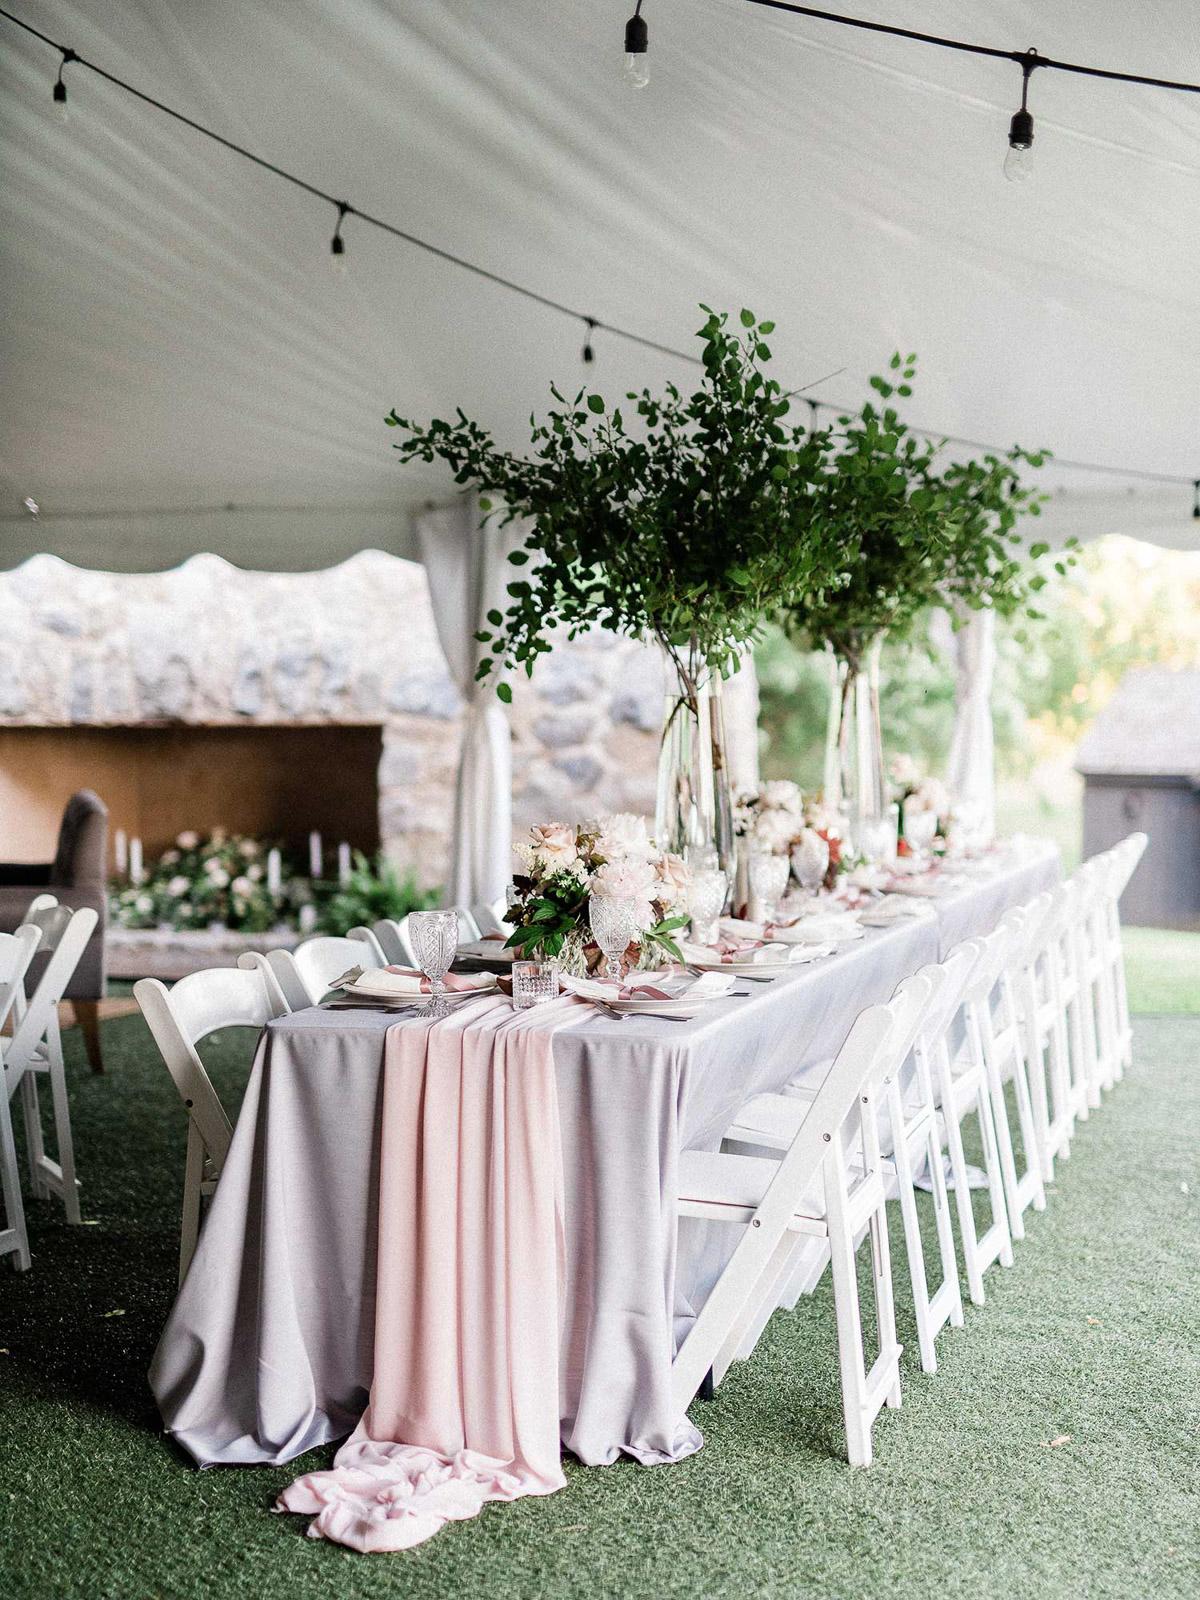 destiny-dawn-photography-vineyard-bride-swish-list-knollwood-golf-and-country-club-ancaster-wedding-editorial-45.jpg